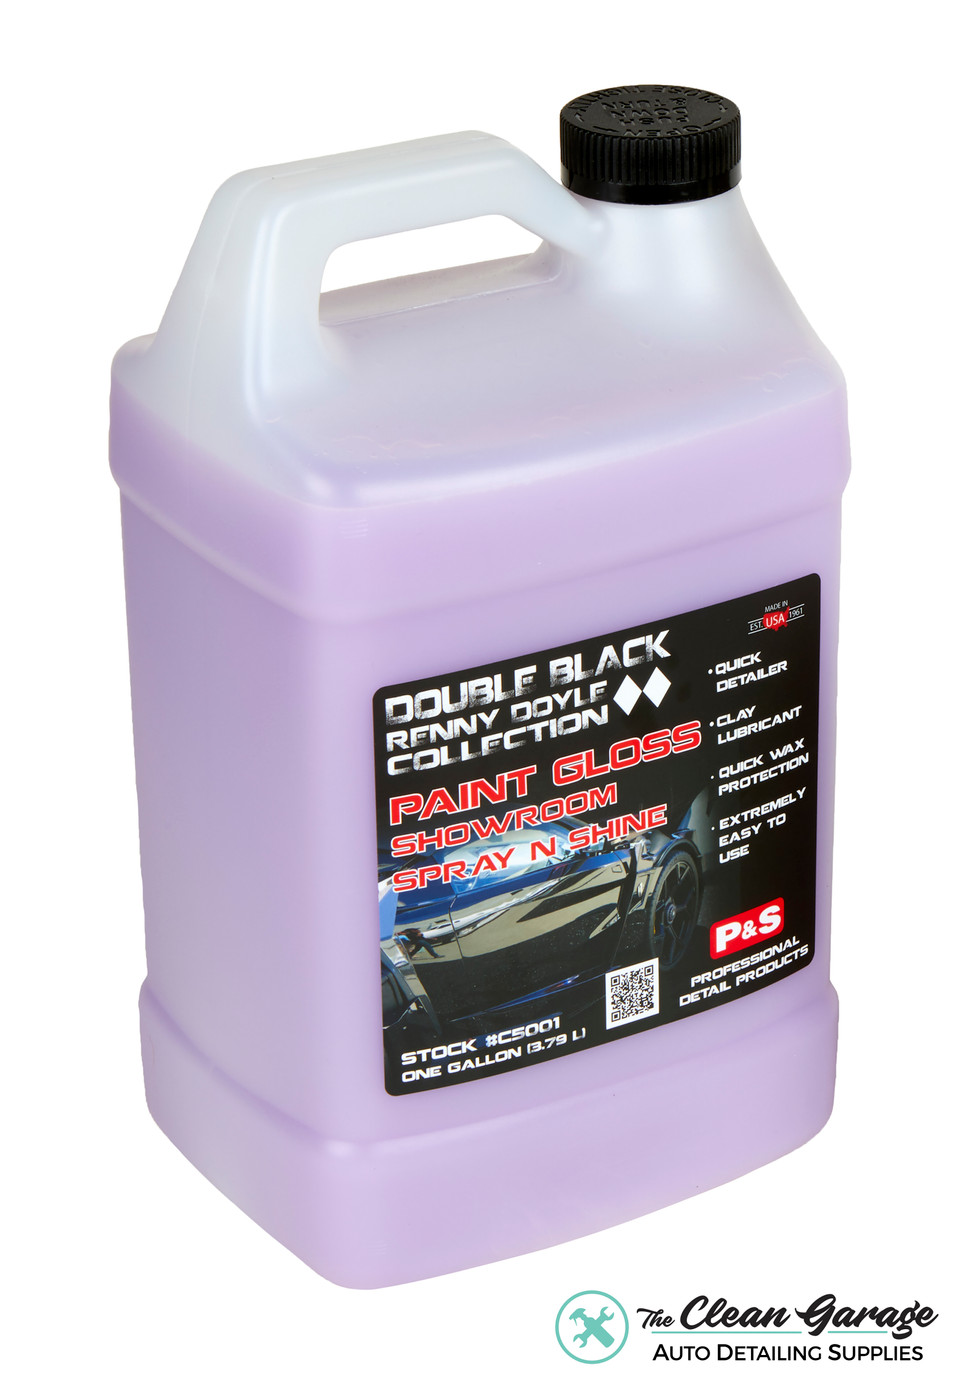 P&S Paint Gloss 1 Gallon | Double Black Detail Spray